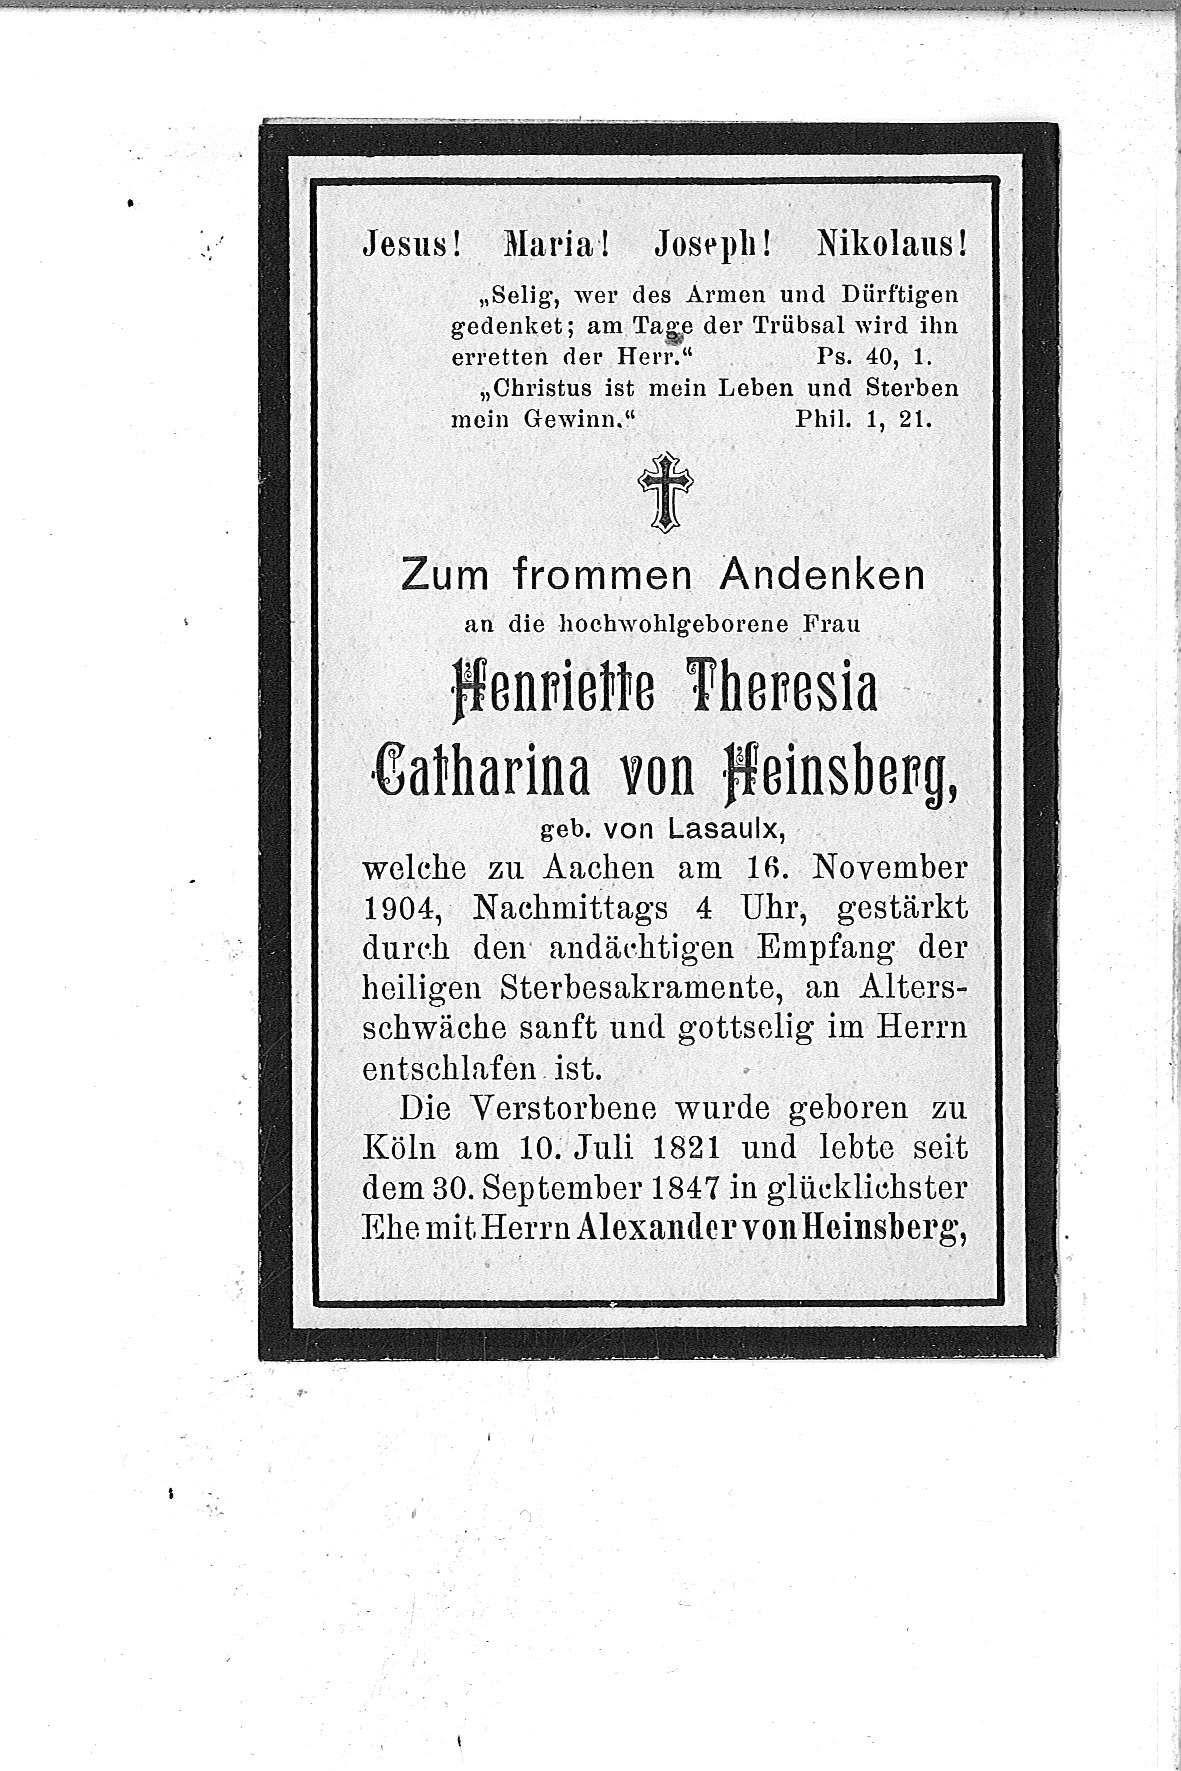 Henriette-Theresia-Catharina-(1904)-20121002115849_00023.jpg